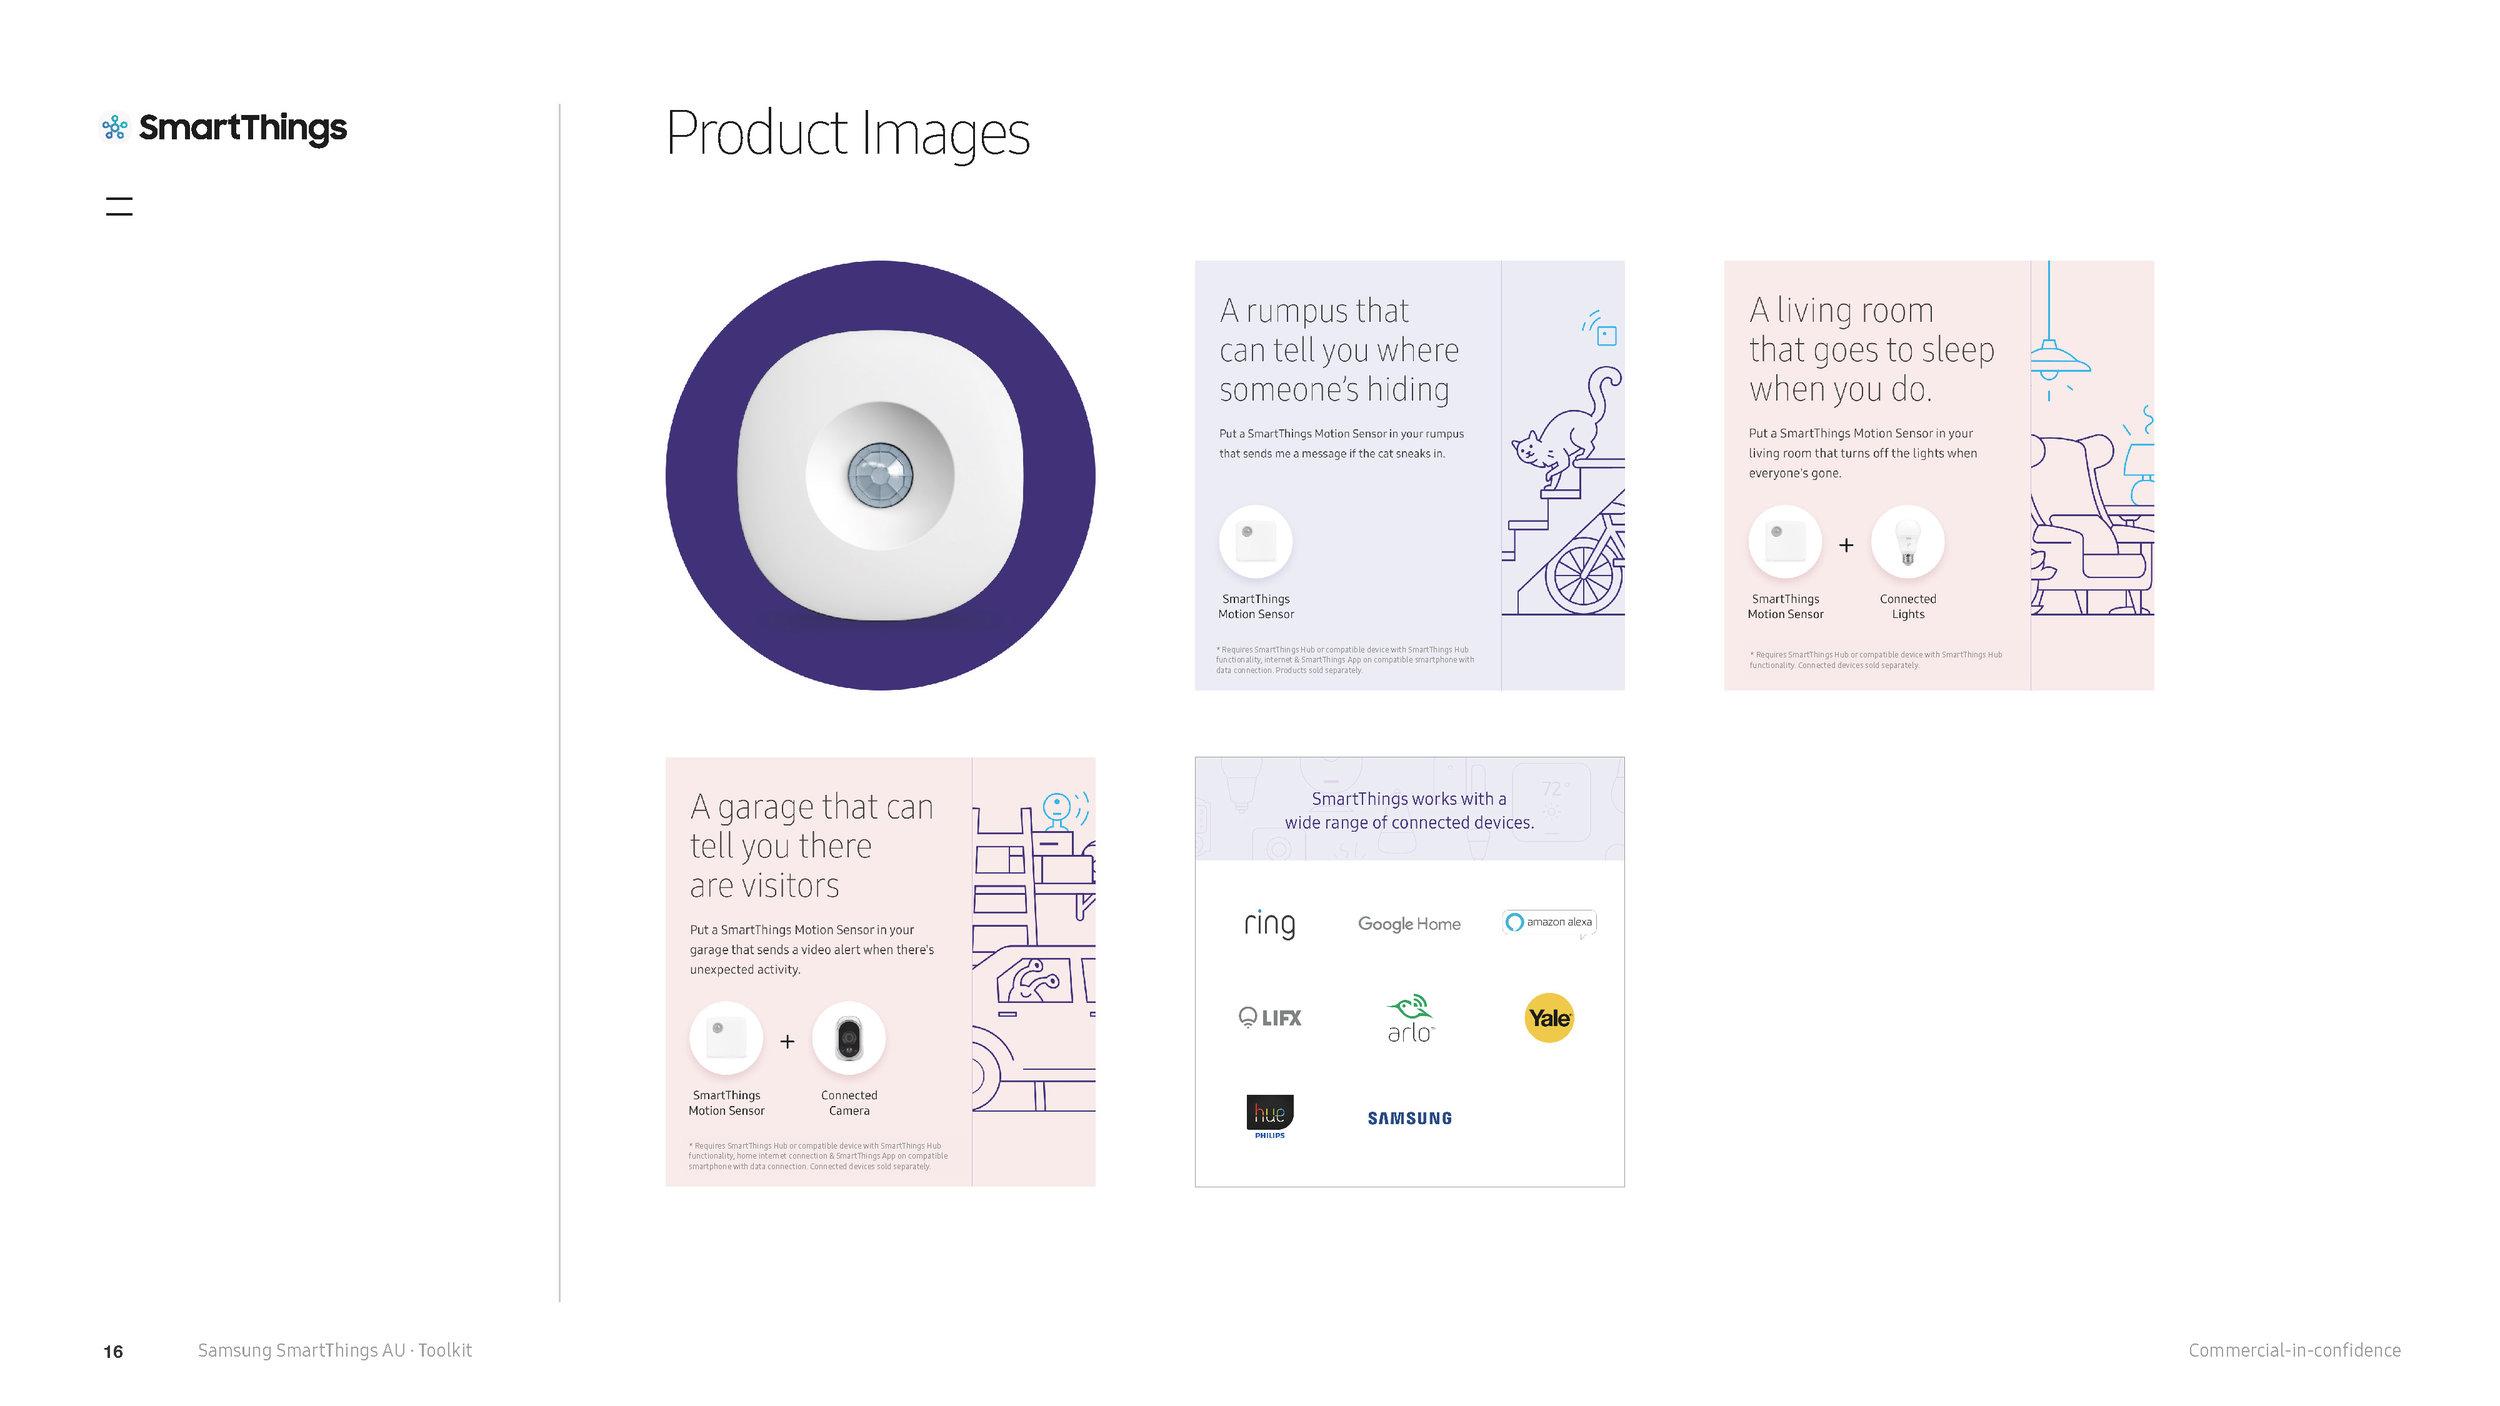 Samsung SmartThings Toolkit 6_Page_16.jpg